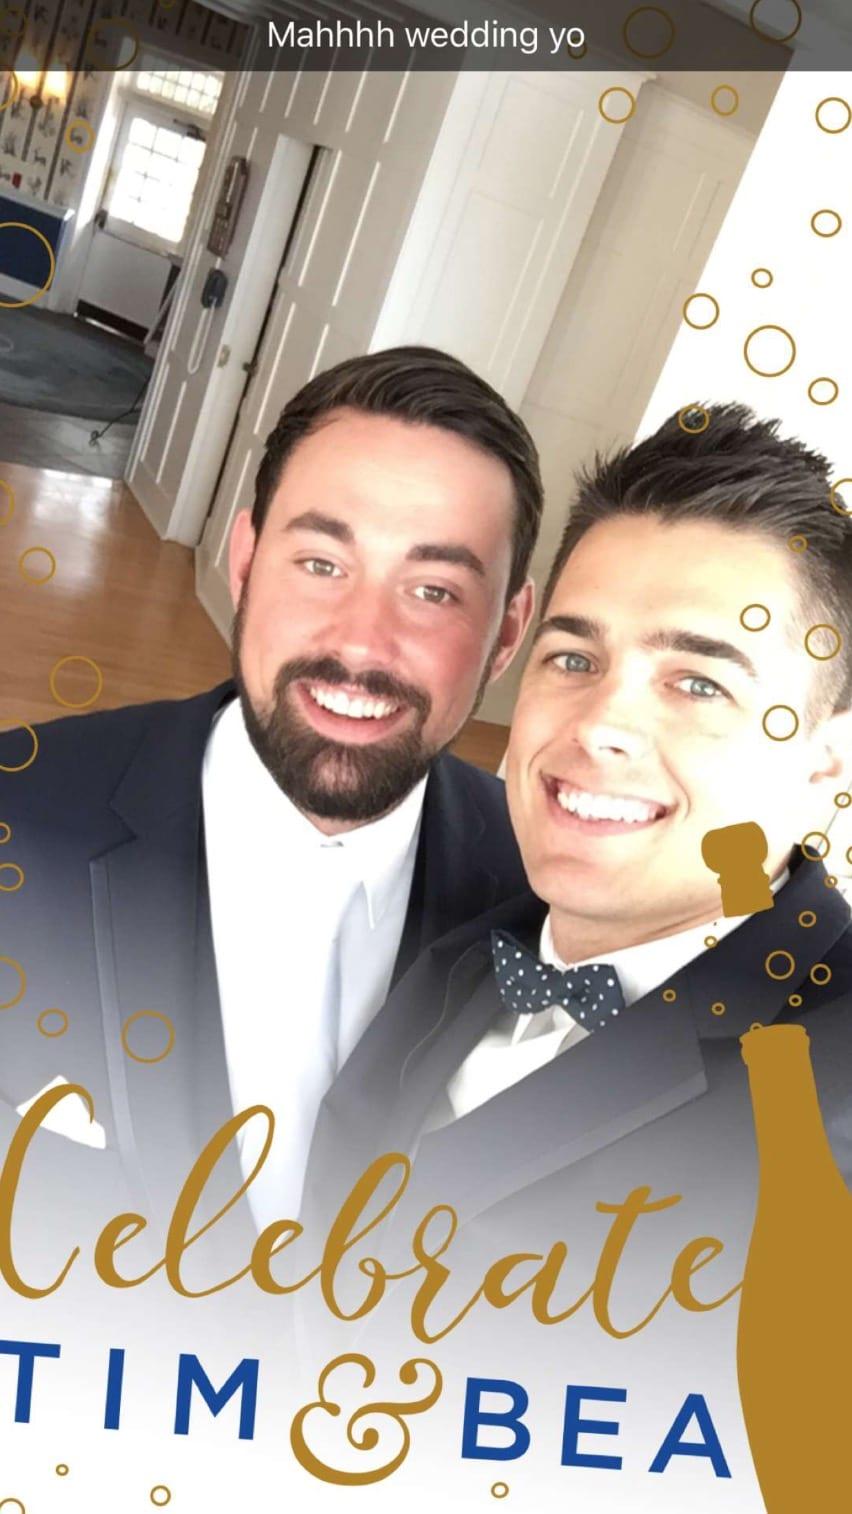 Snapchat inspiration for wedding filter